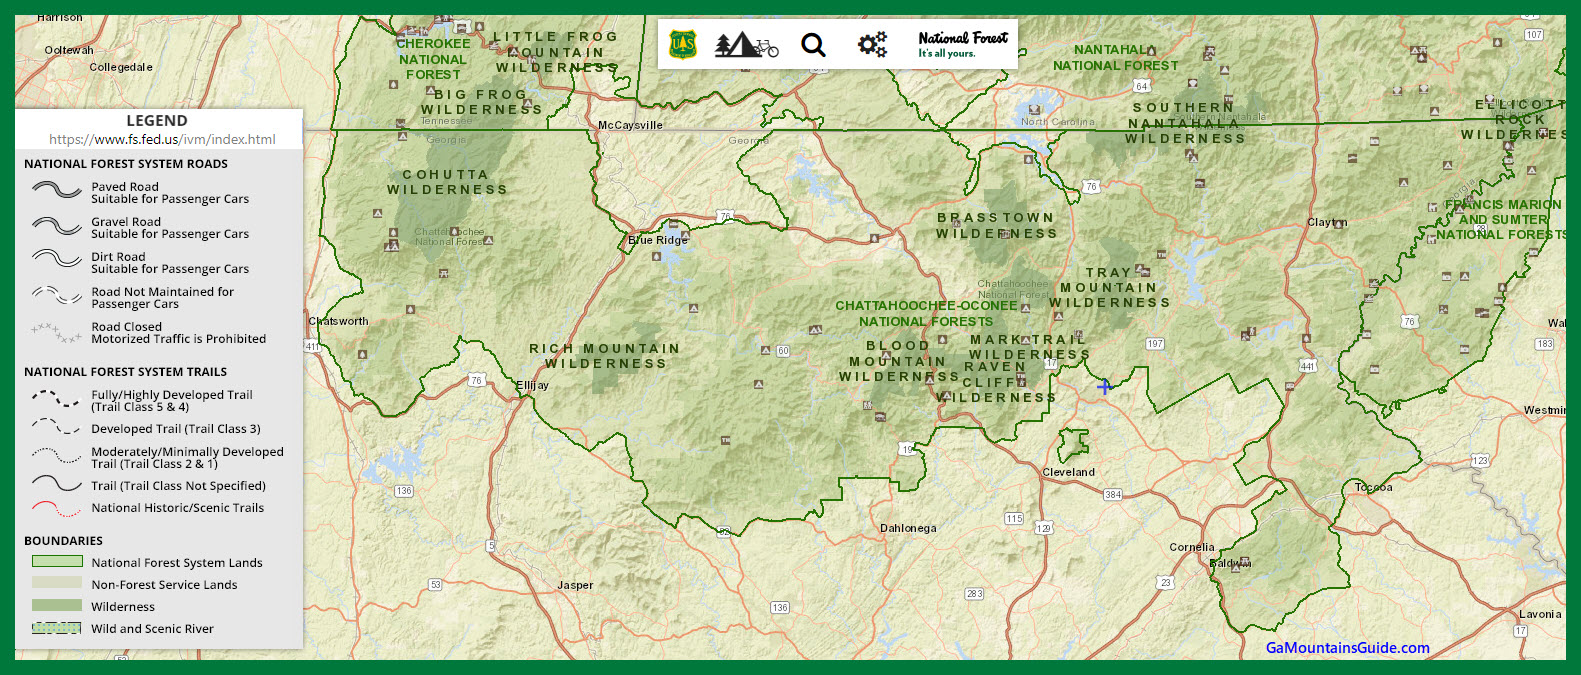 US Forest Service Ga Mountains - GaMountainsGuide.com